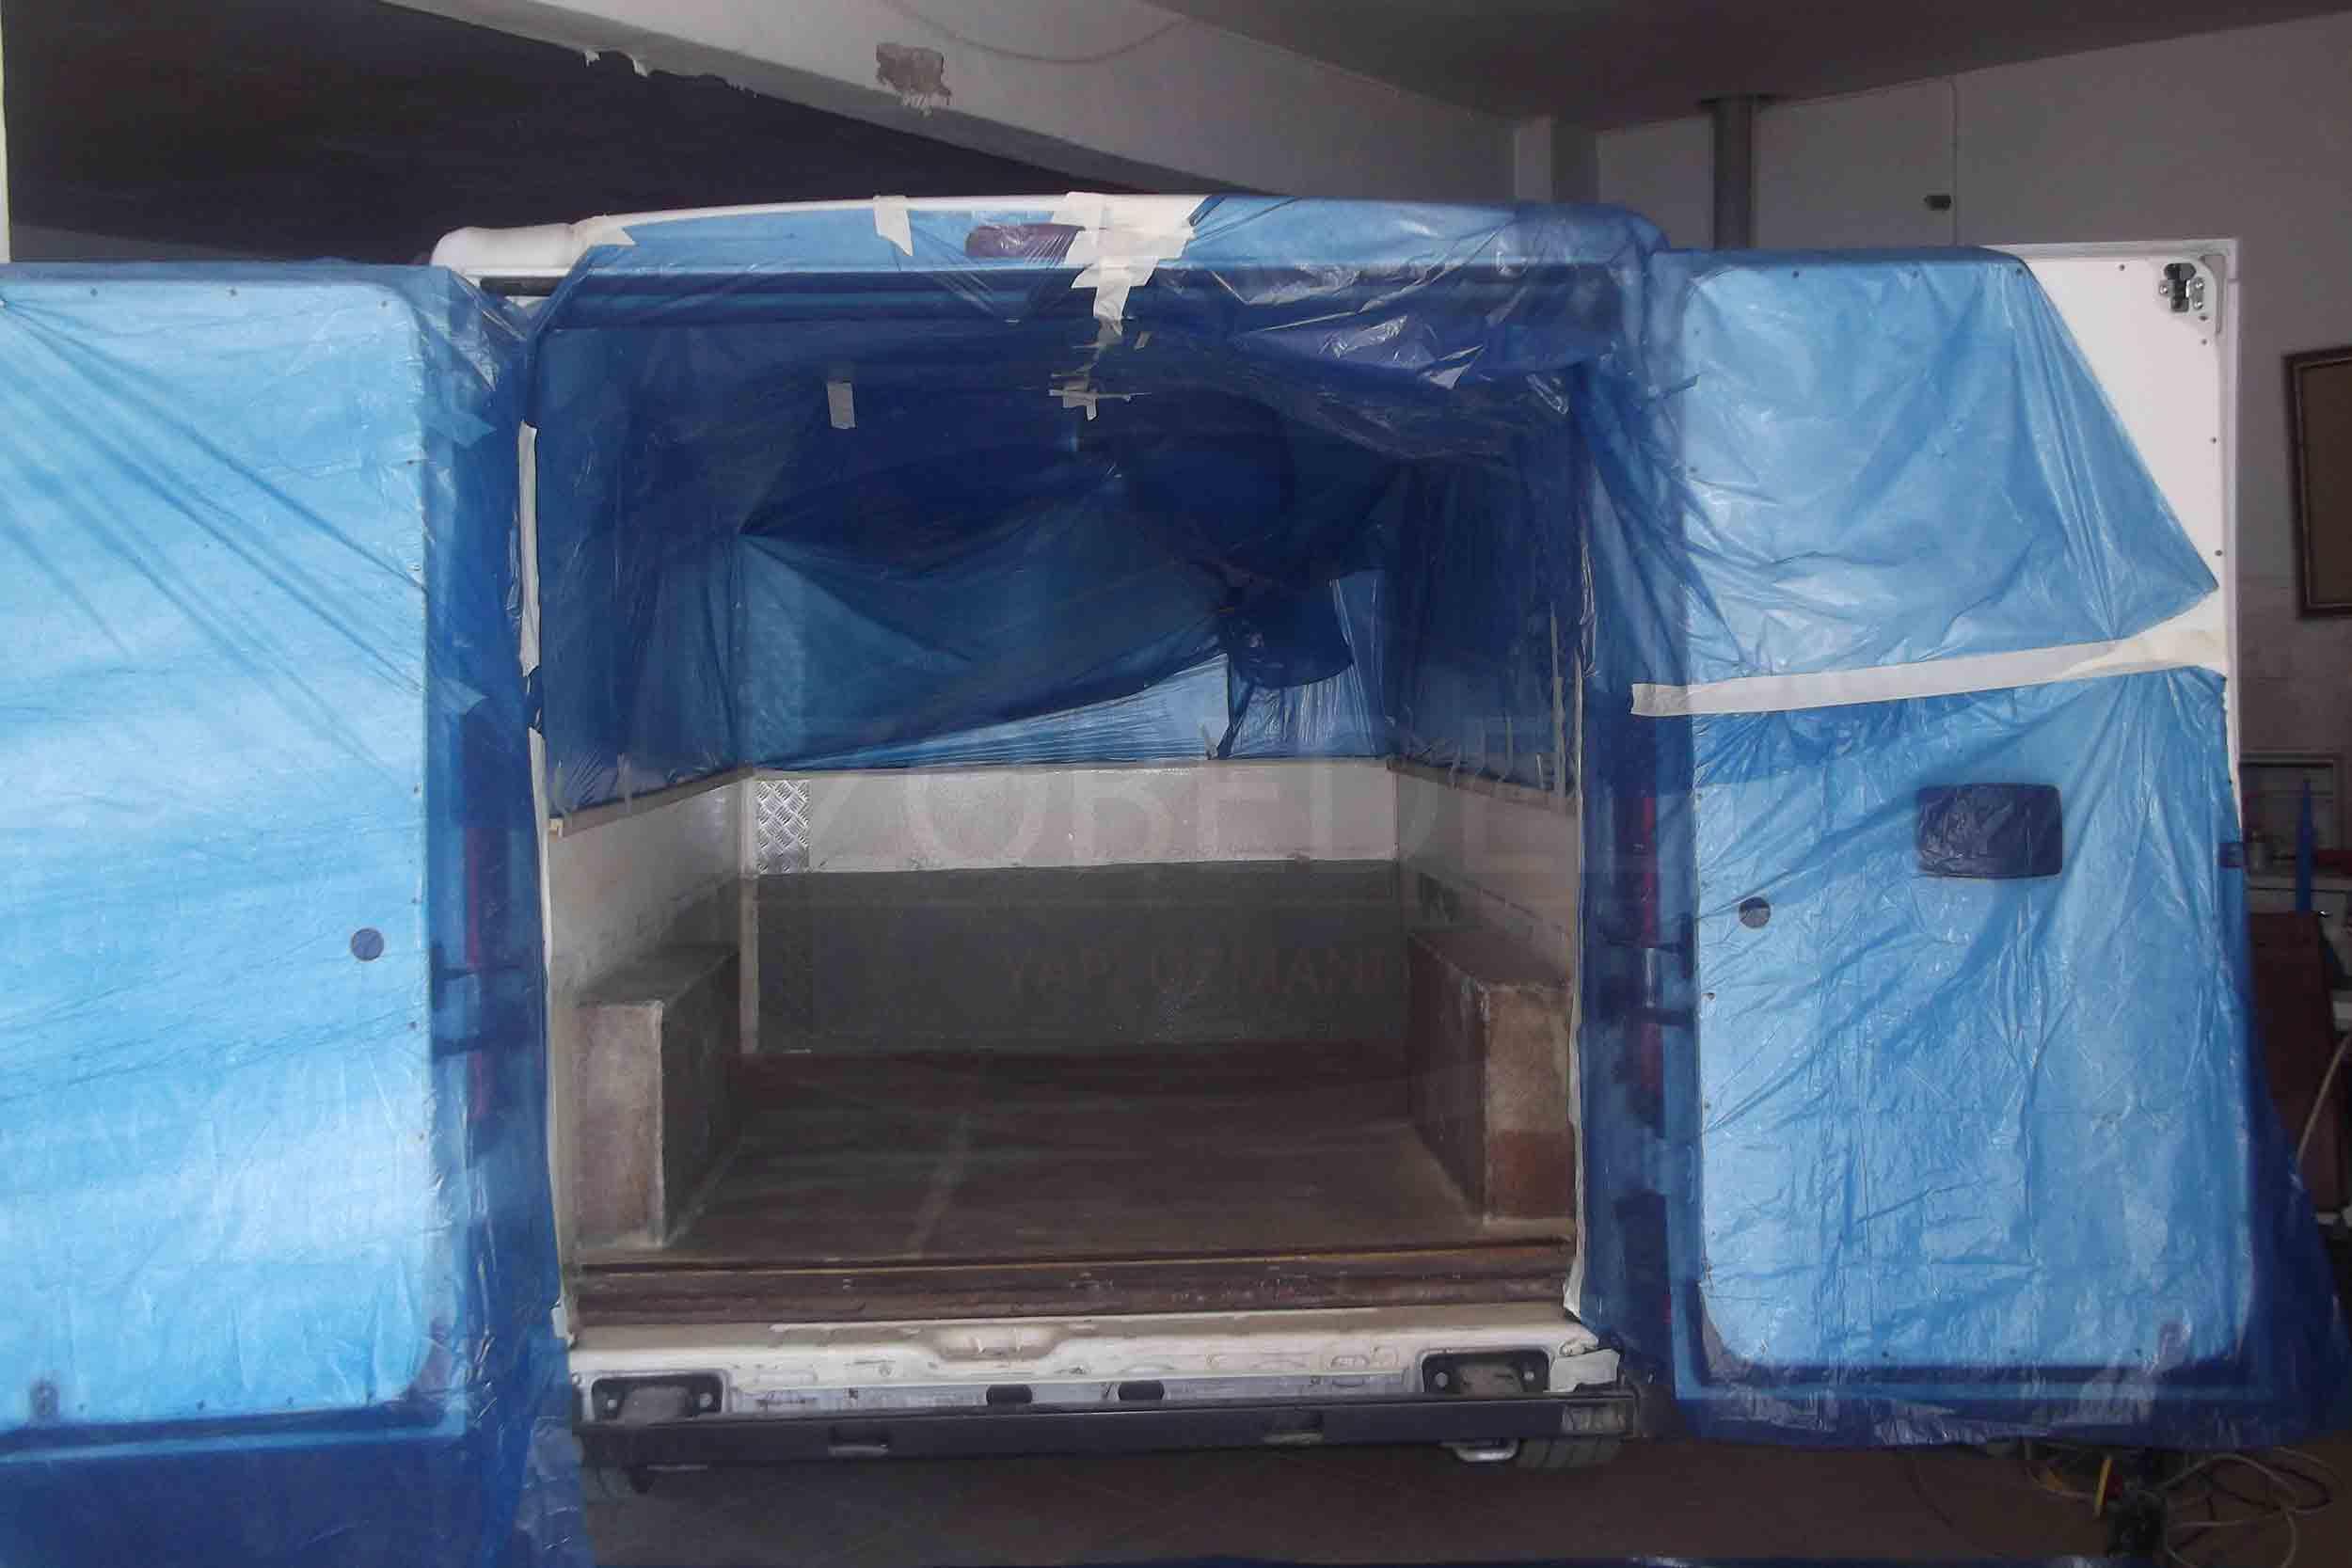 sprey-polyurea-araç-kasa-kaplama5